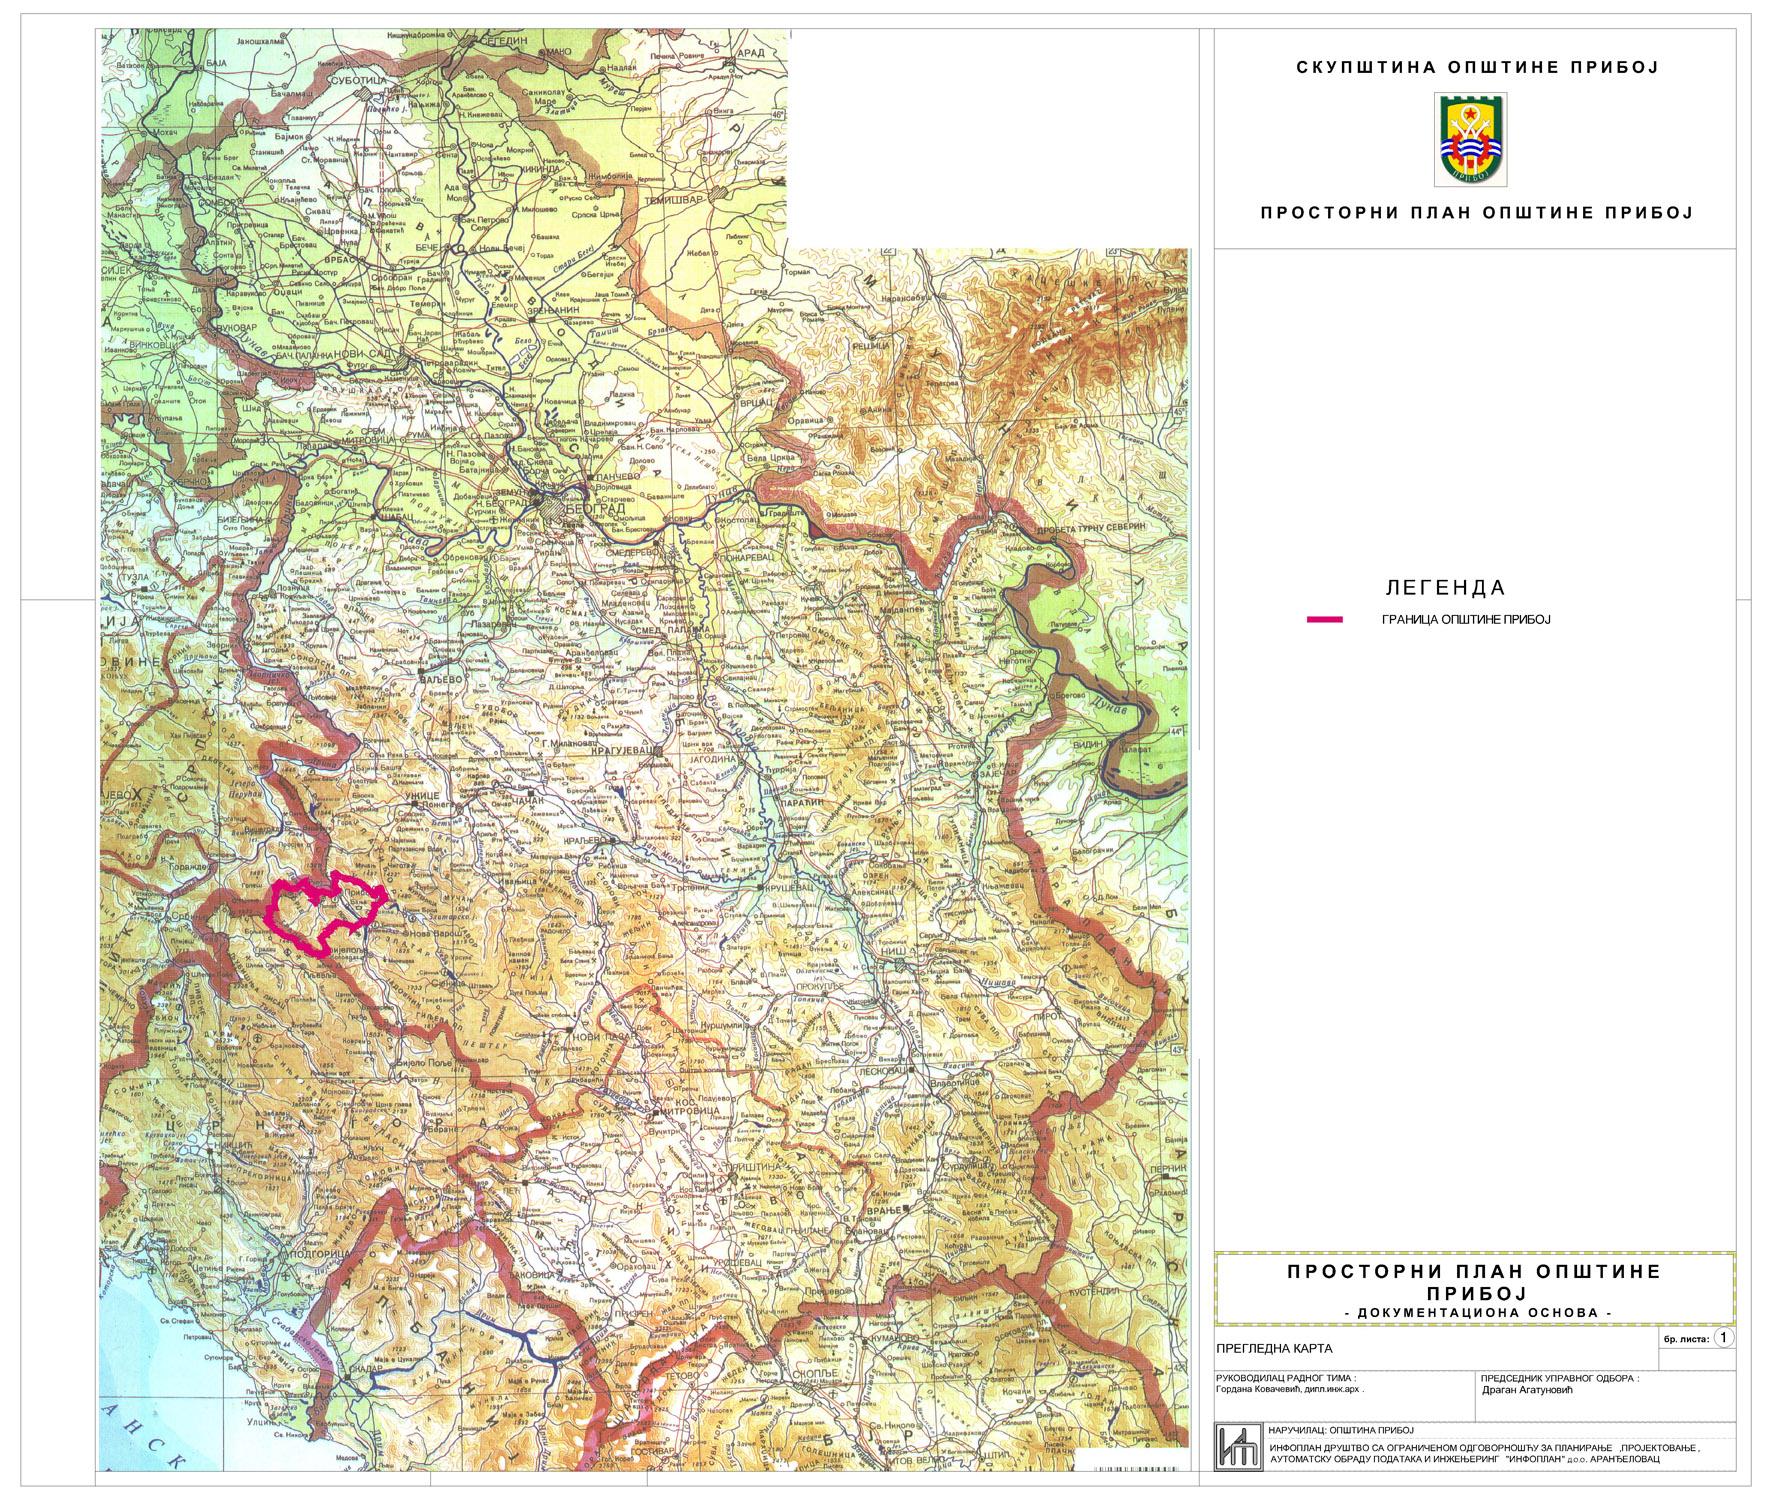 Geografska Karta Srbije Reljef Superjoden